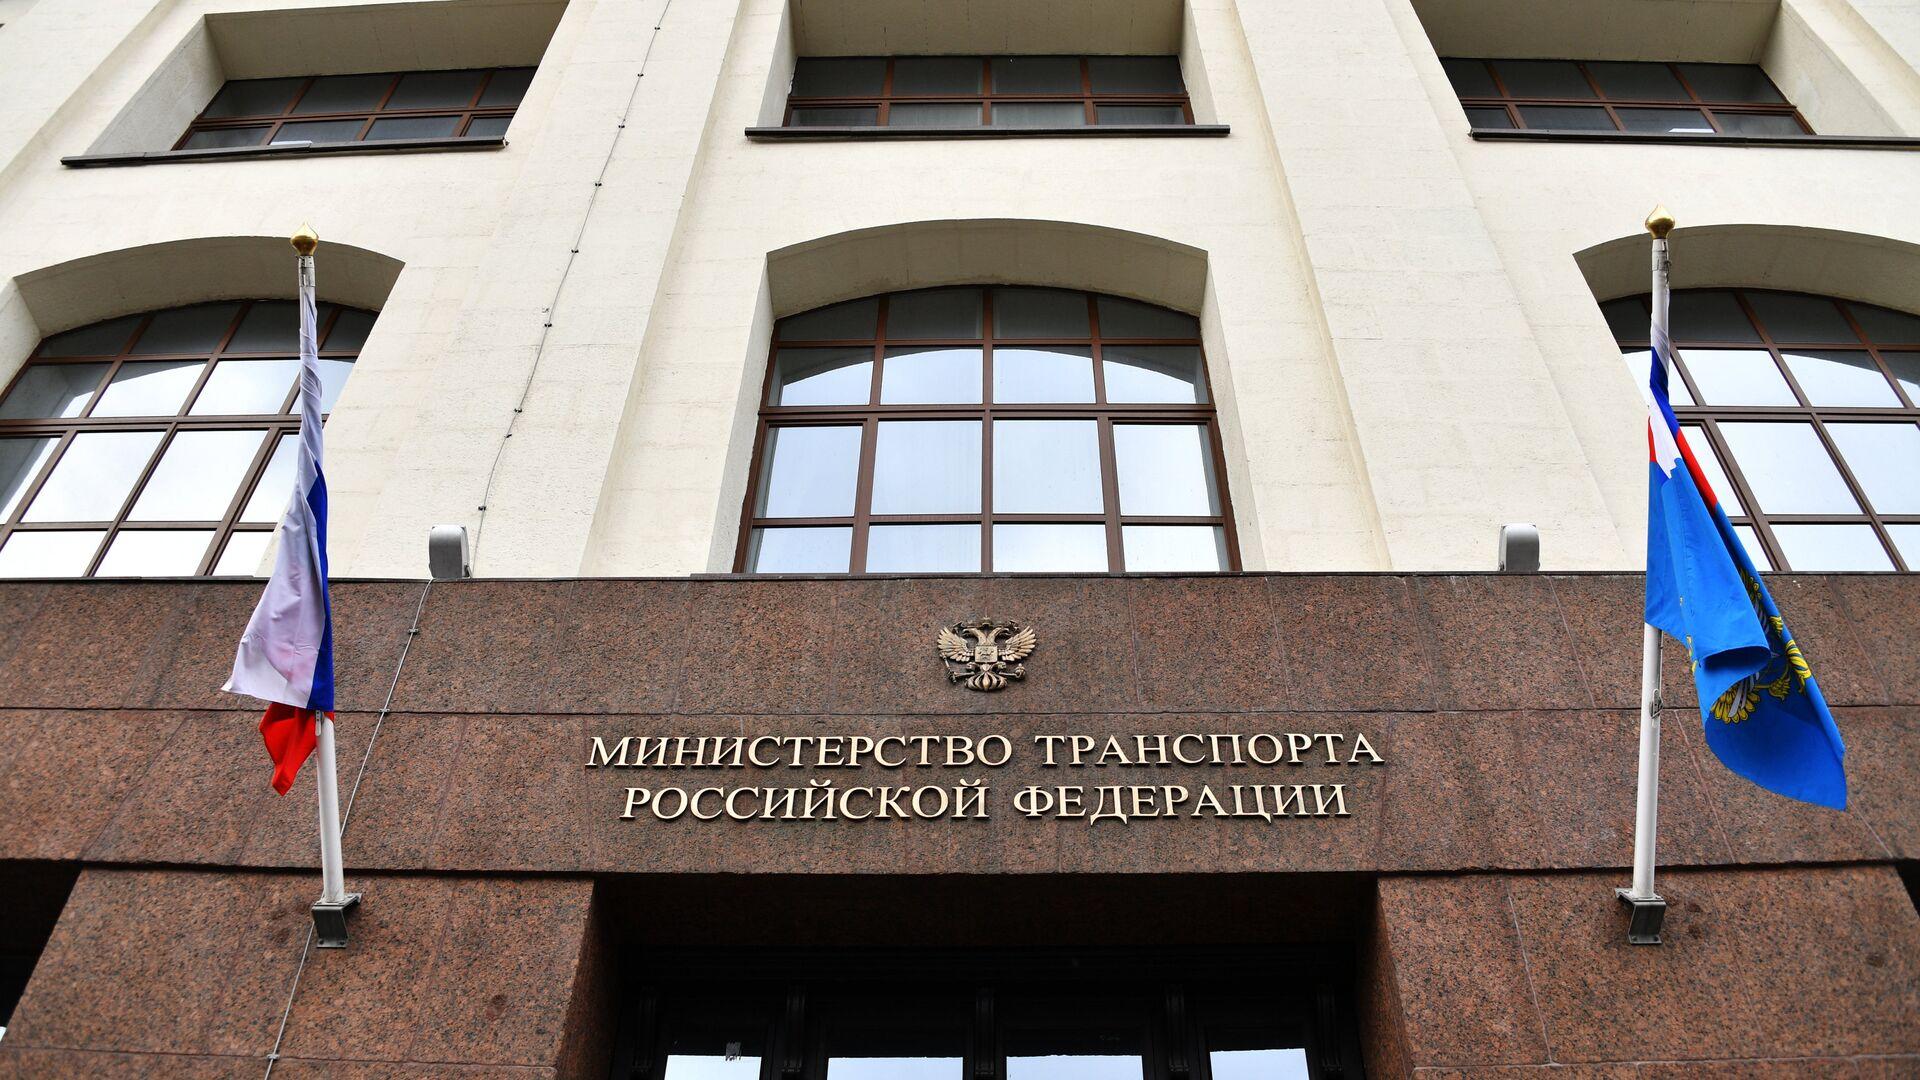 Здание министерства транспорта РФ - РИА Новости, 1920, 05.10.2020